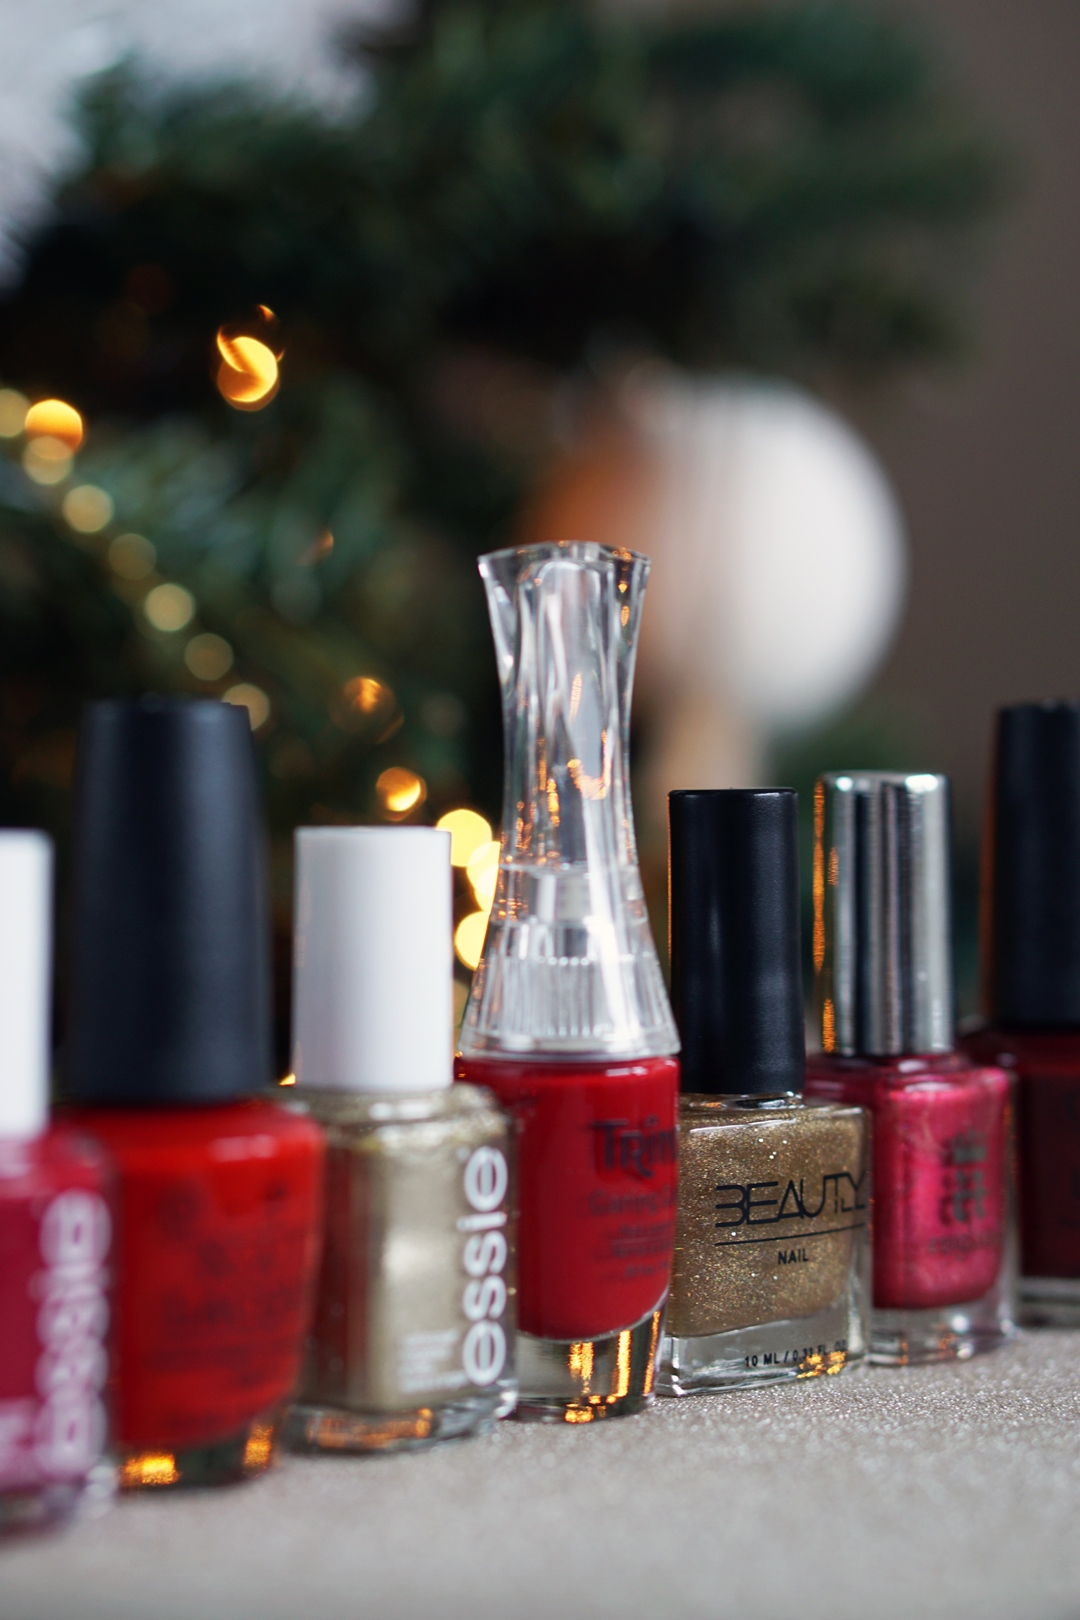 Actie Tijn 3FM Serious Request / favoriete kerst nagellak